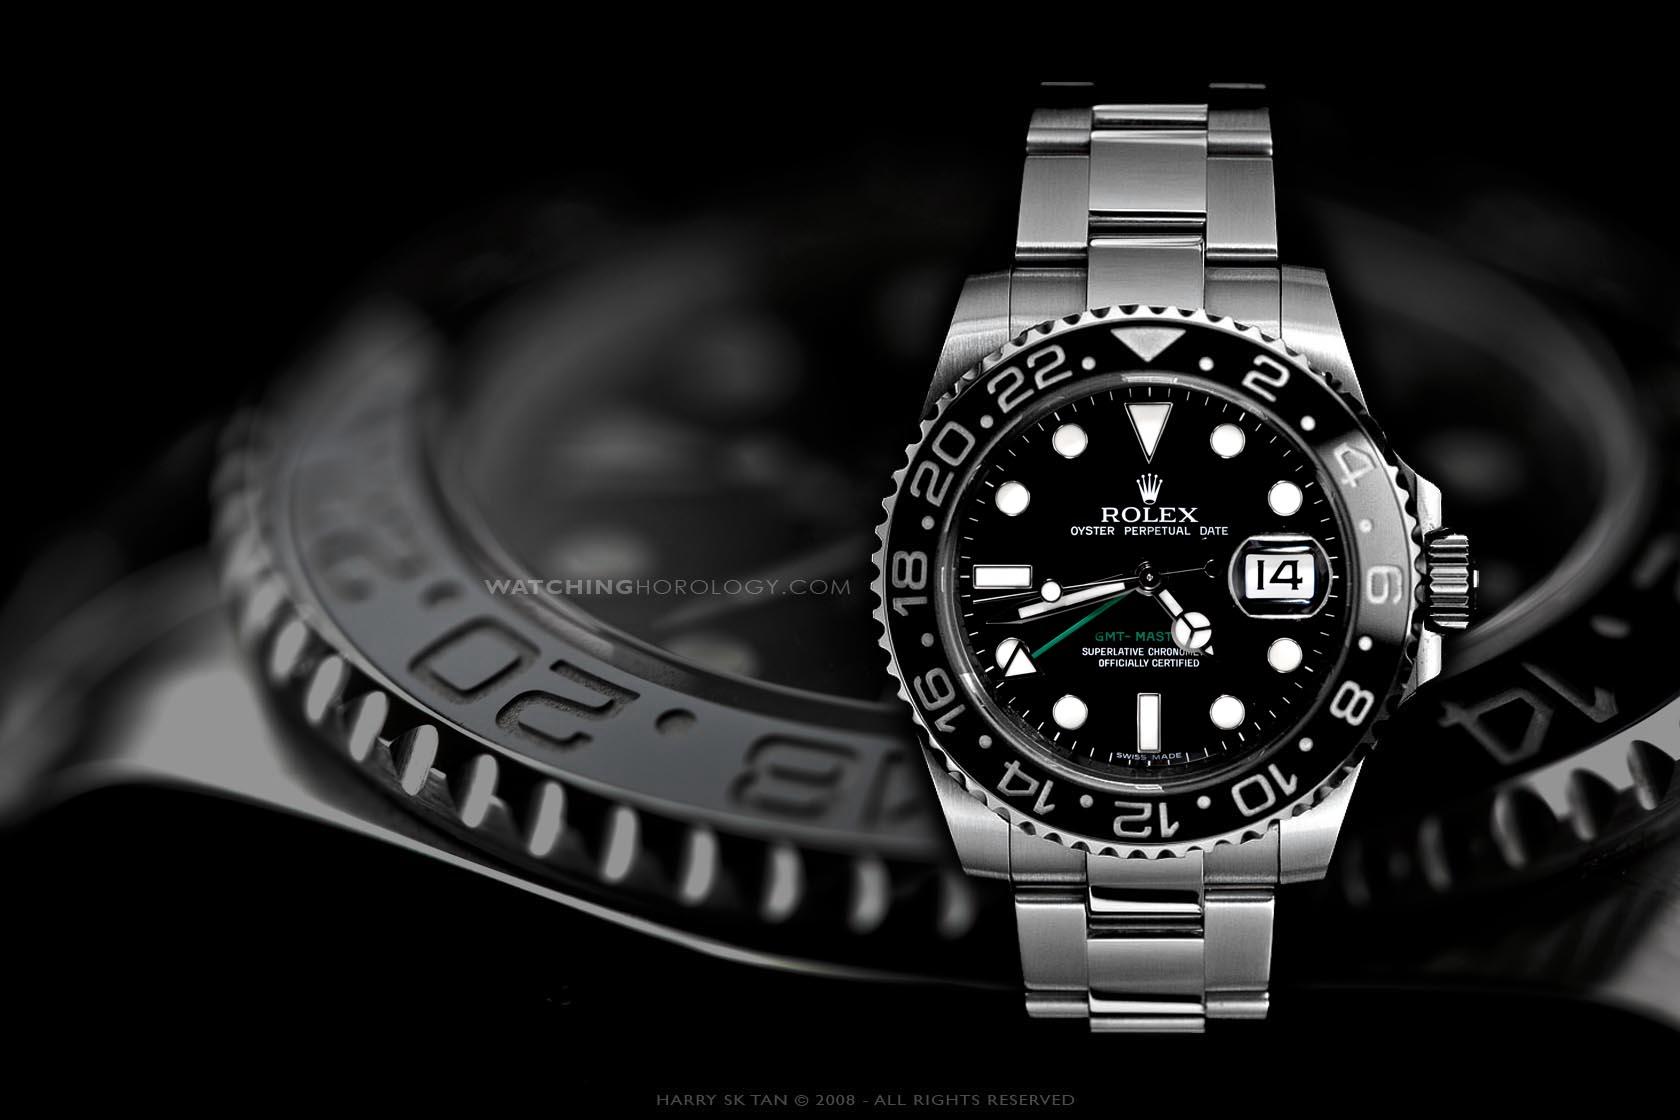 Directory Photo, Watch - Rolex Gmt 2 (#61413) - HD Wallpaper ...